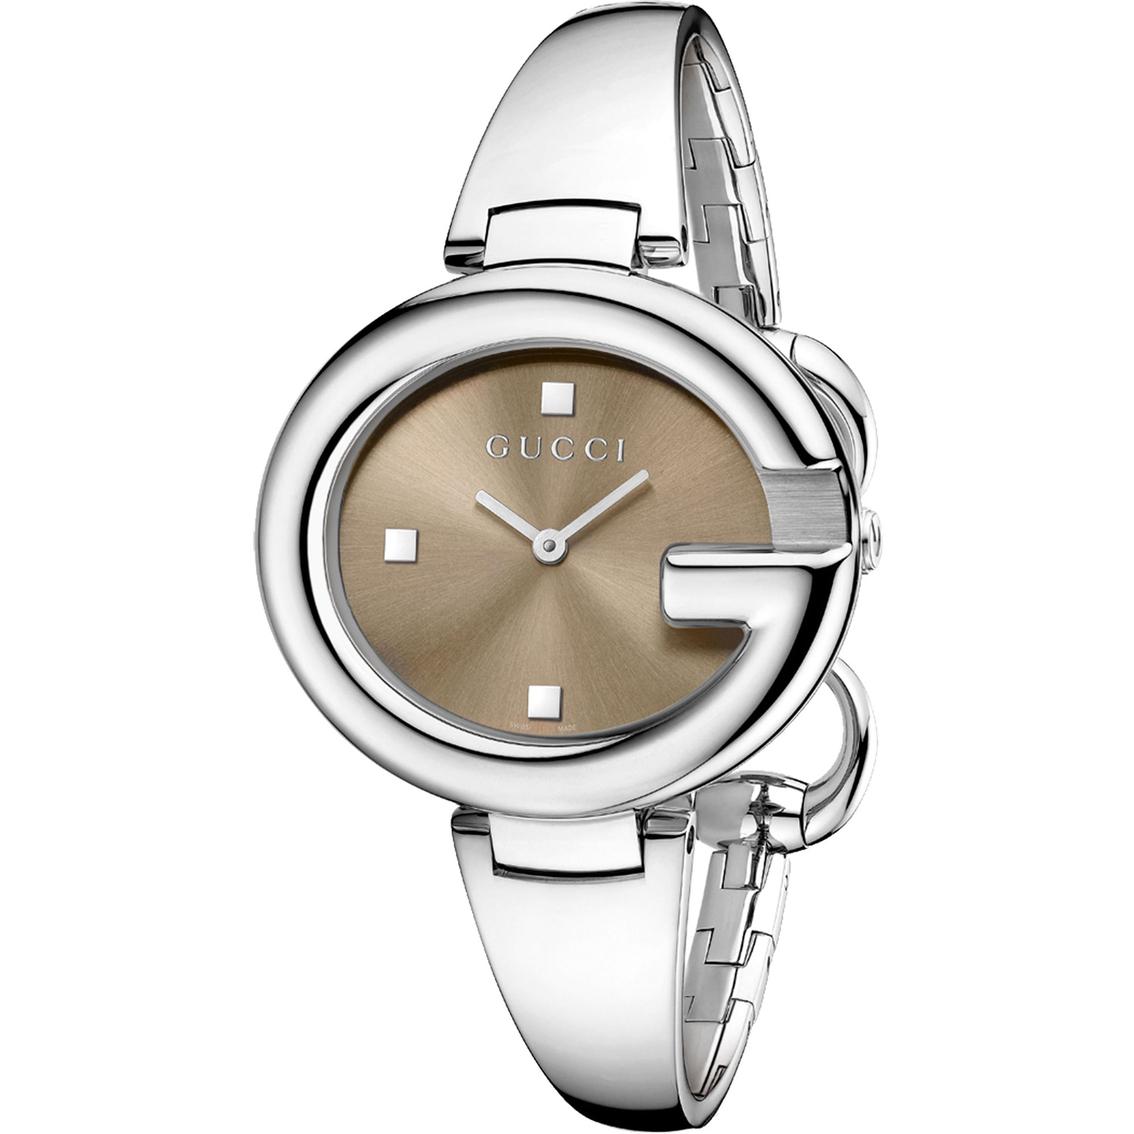 edf06ffadb4 Gucci Women s Guccissima Bangle Watch 36mm Ya134302